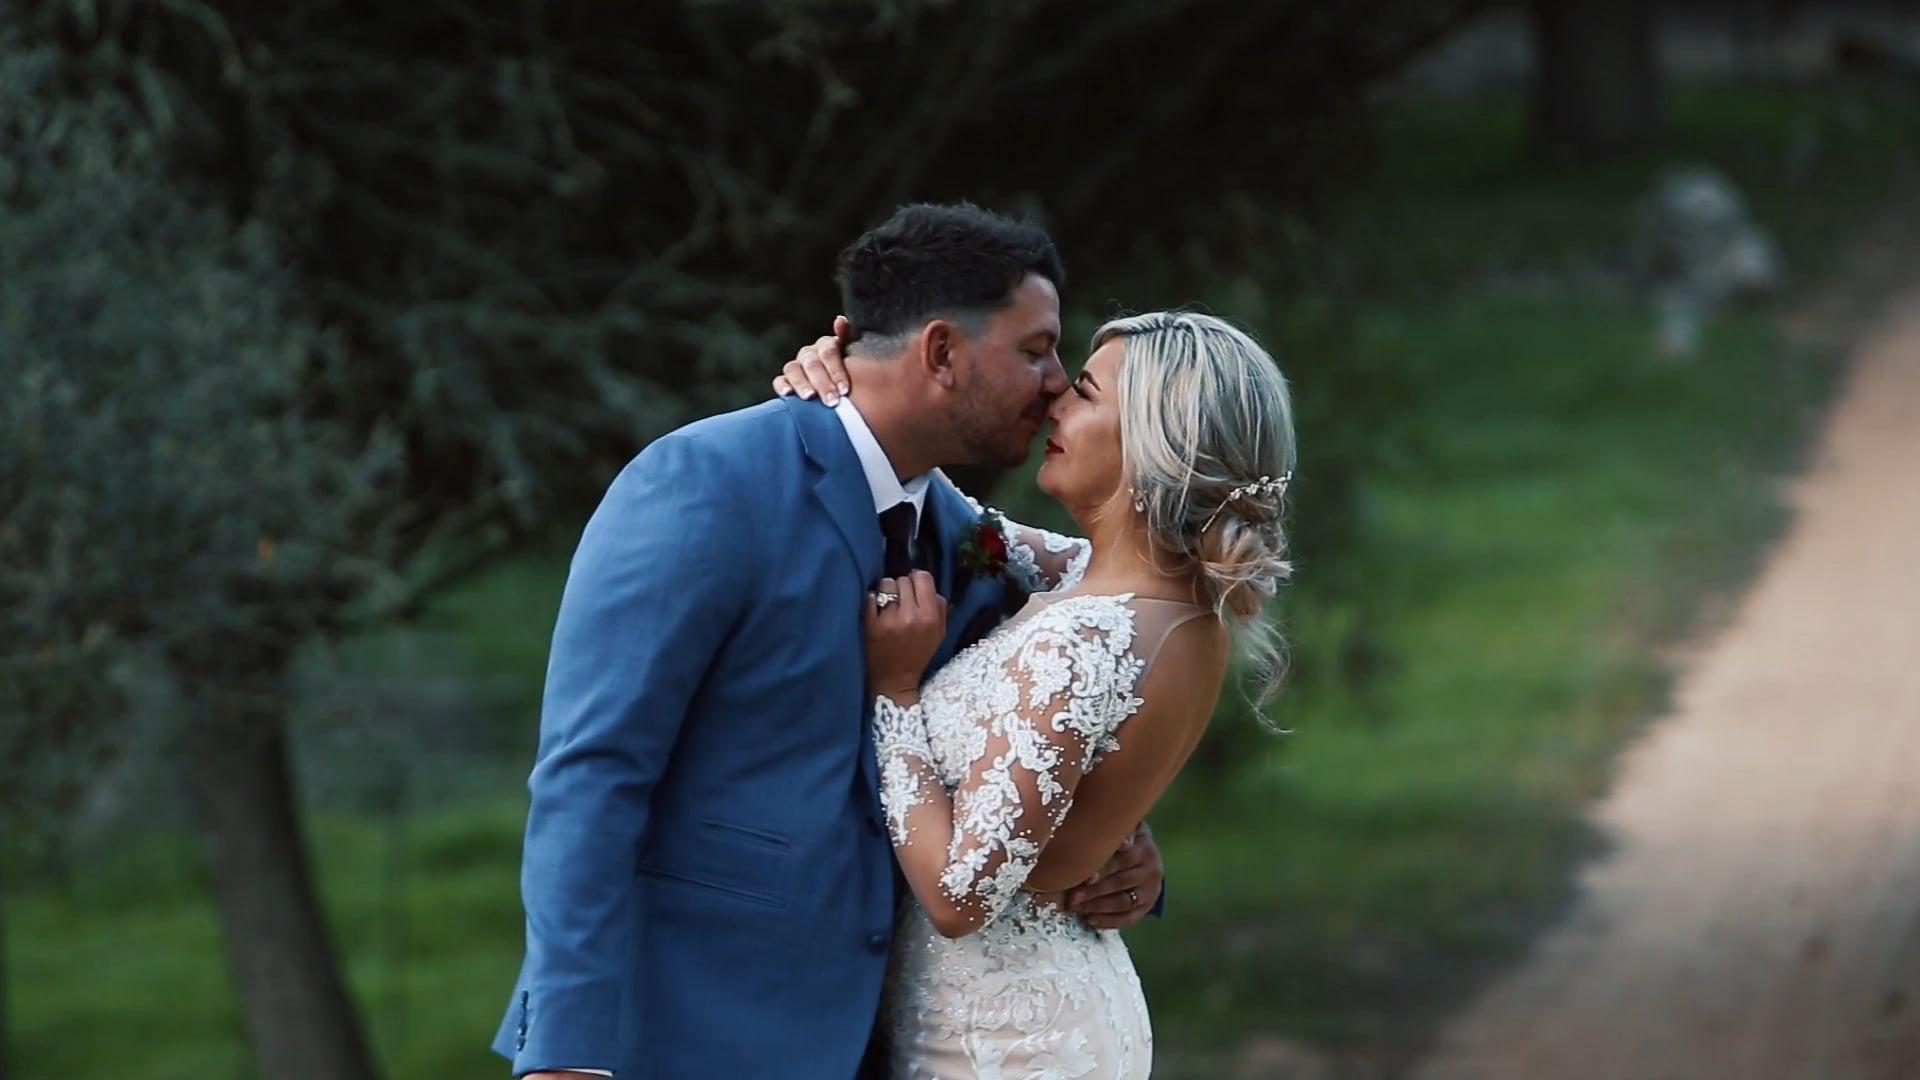 Hendrik and Charmaine wedding preview, Elandskool Greyton - 18 May 2019